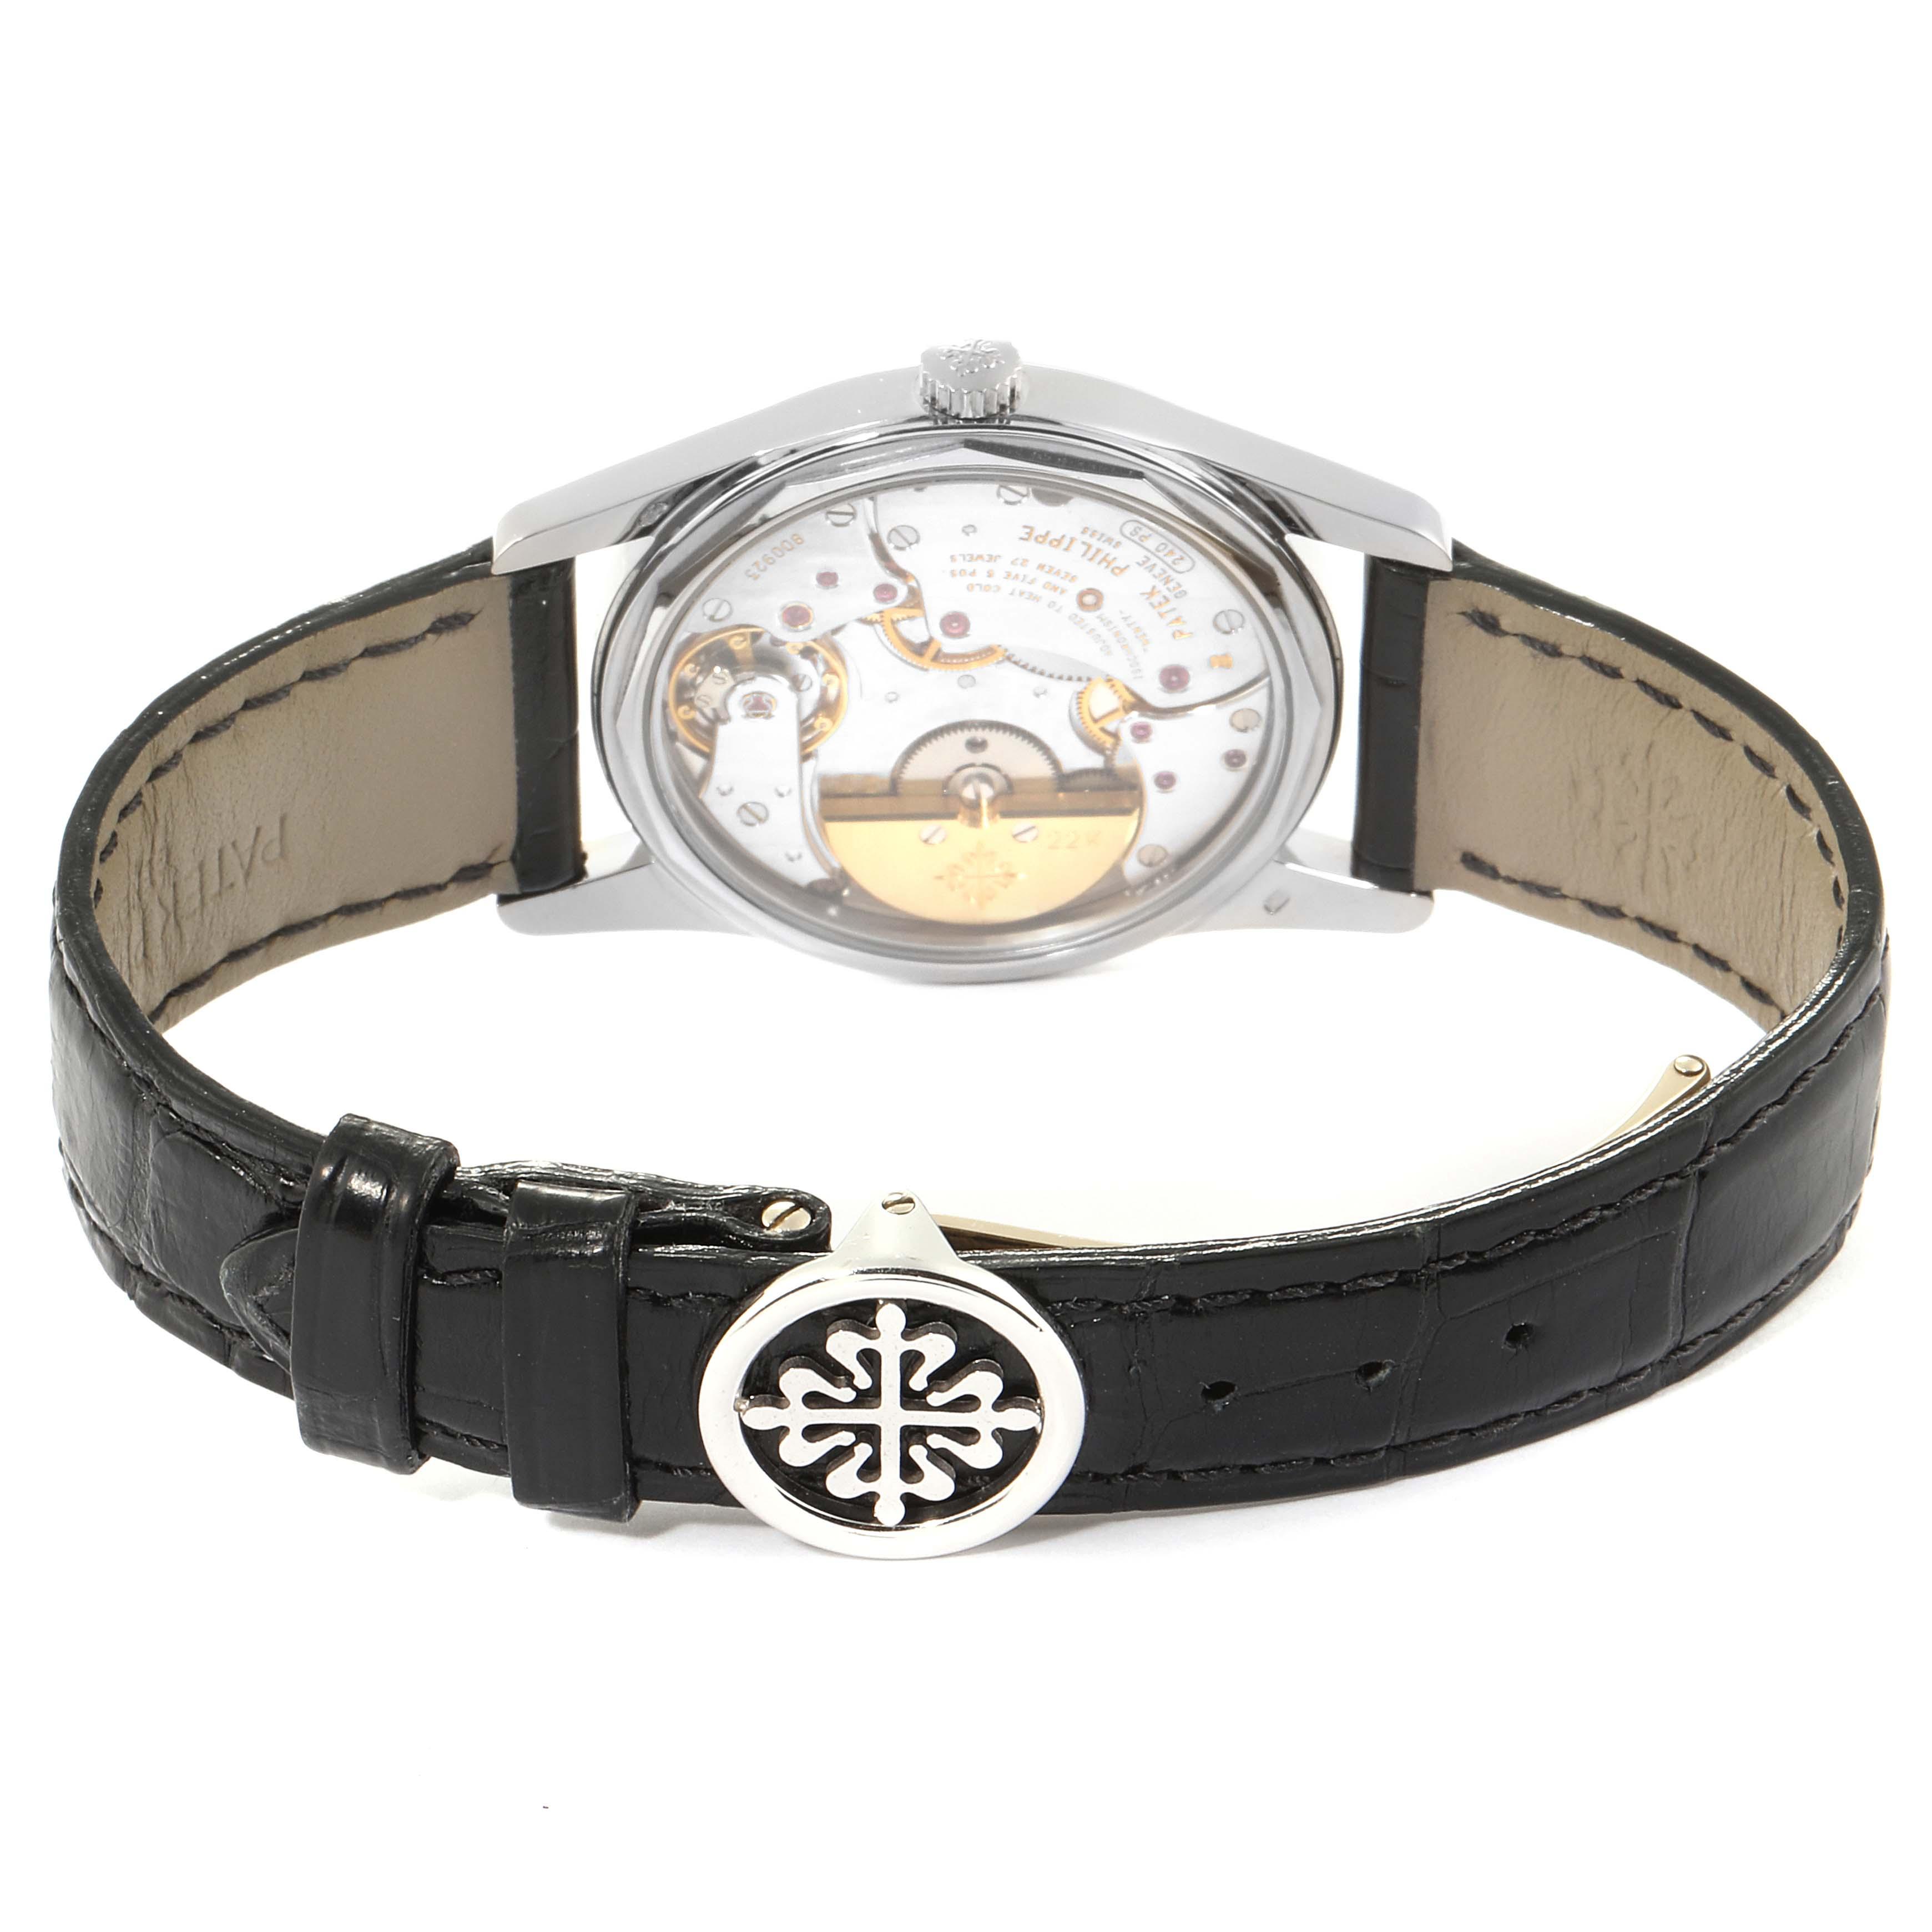 Patek Philippe Calatrava White Gold Black Dial Automatic Mens Watch 5000 SwissWatchExpo